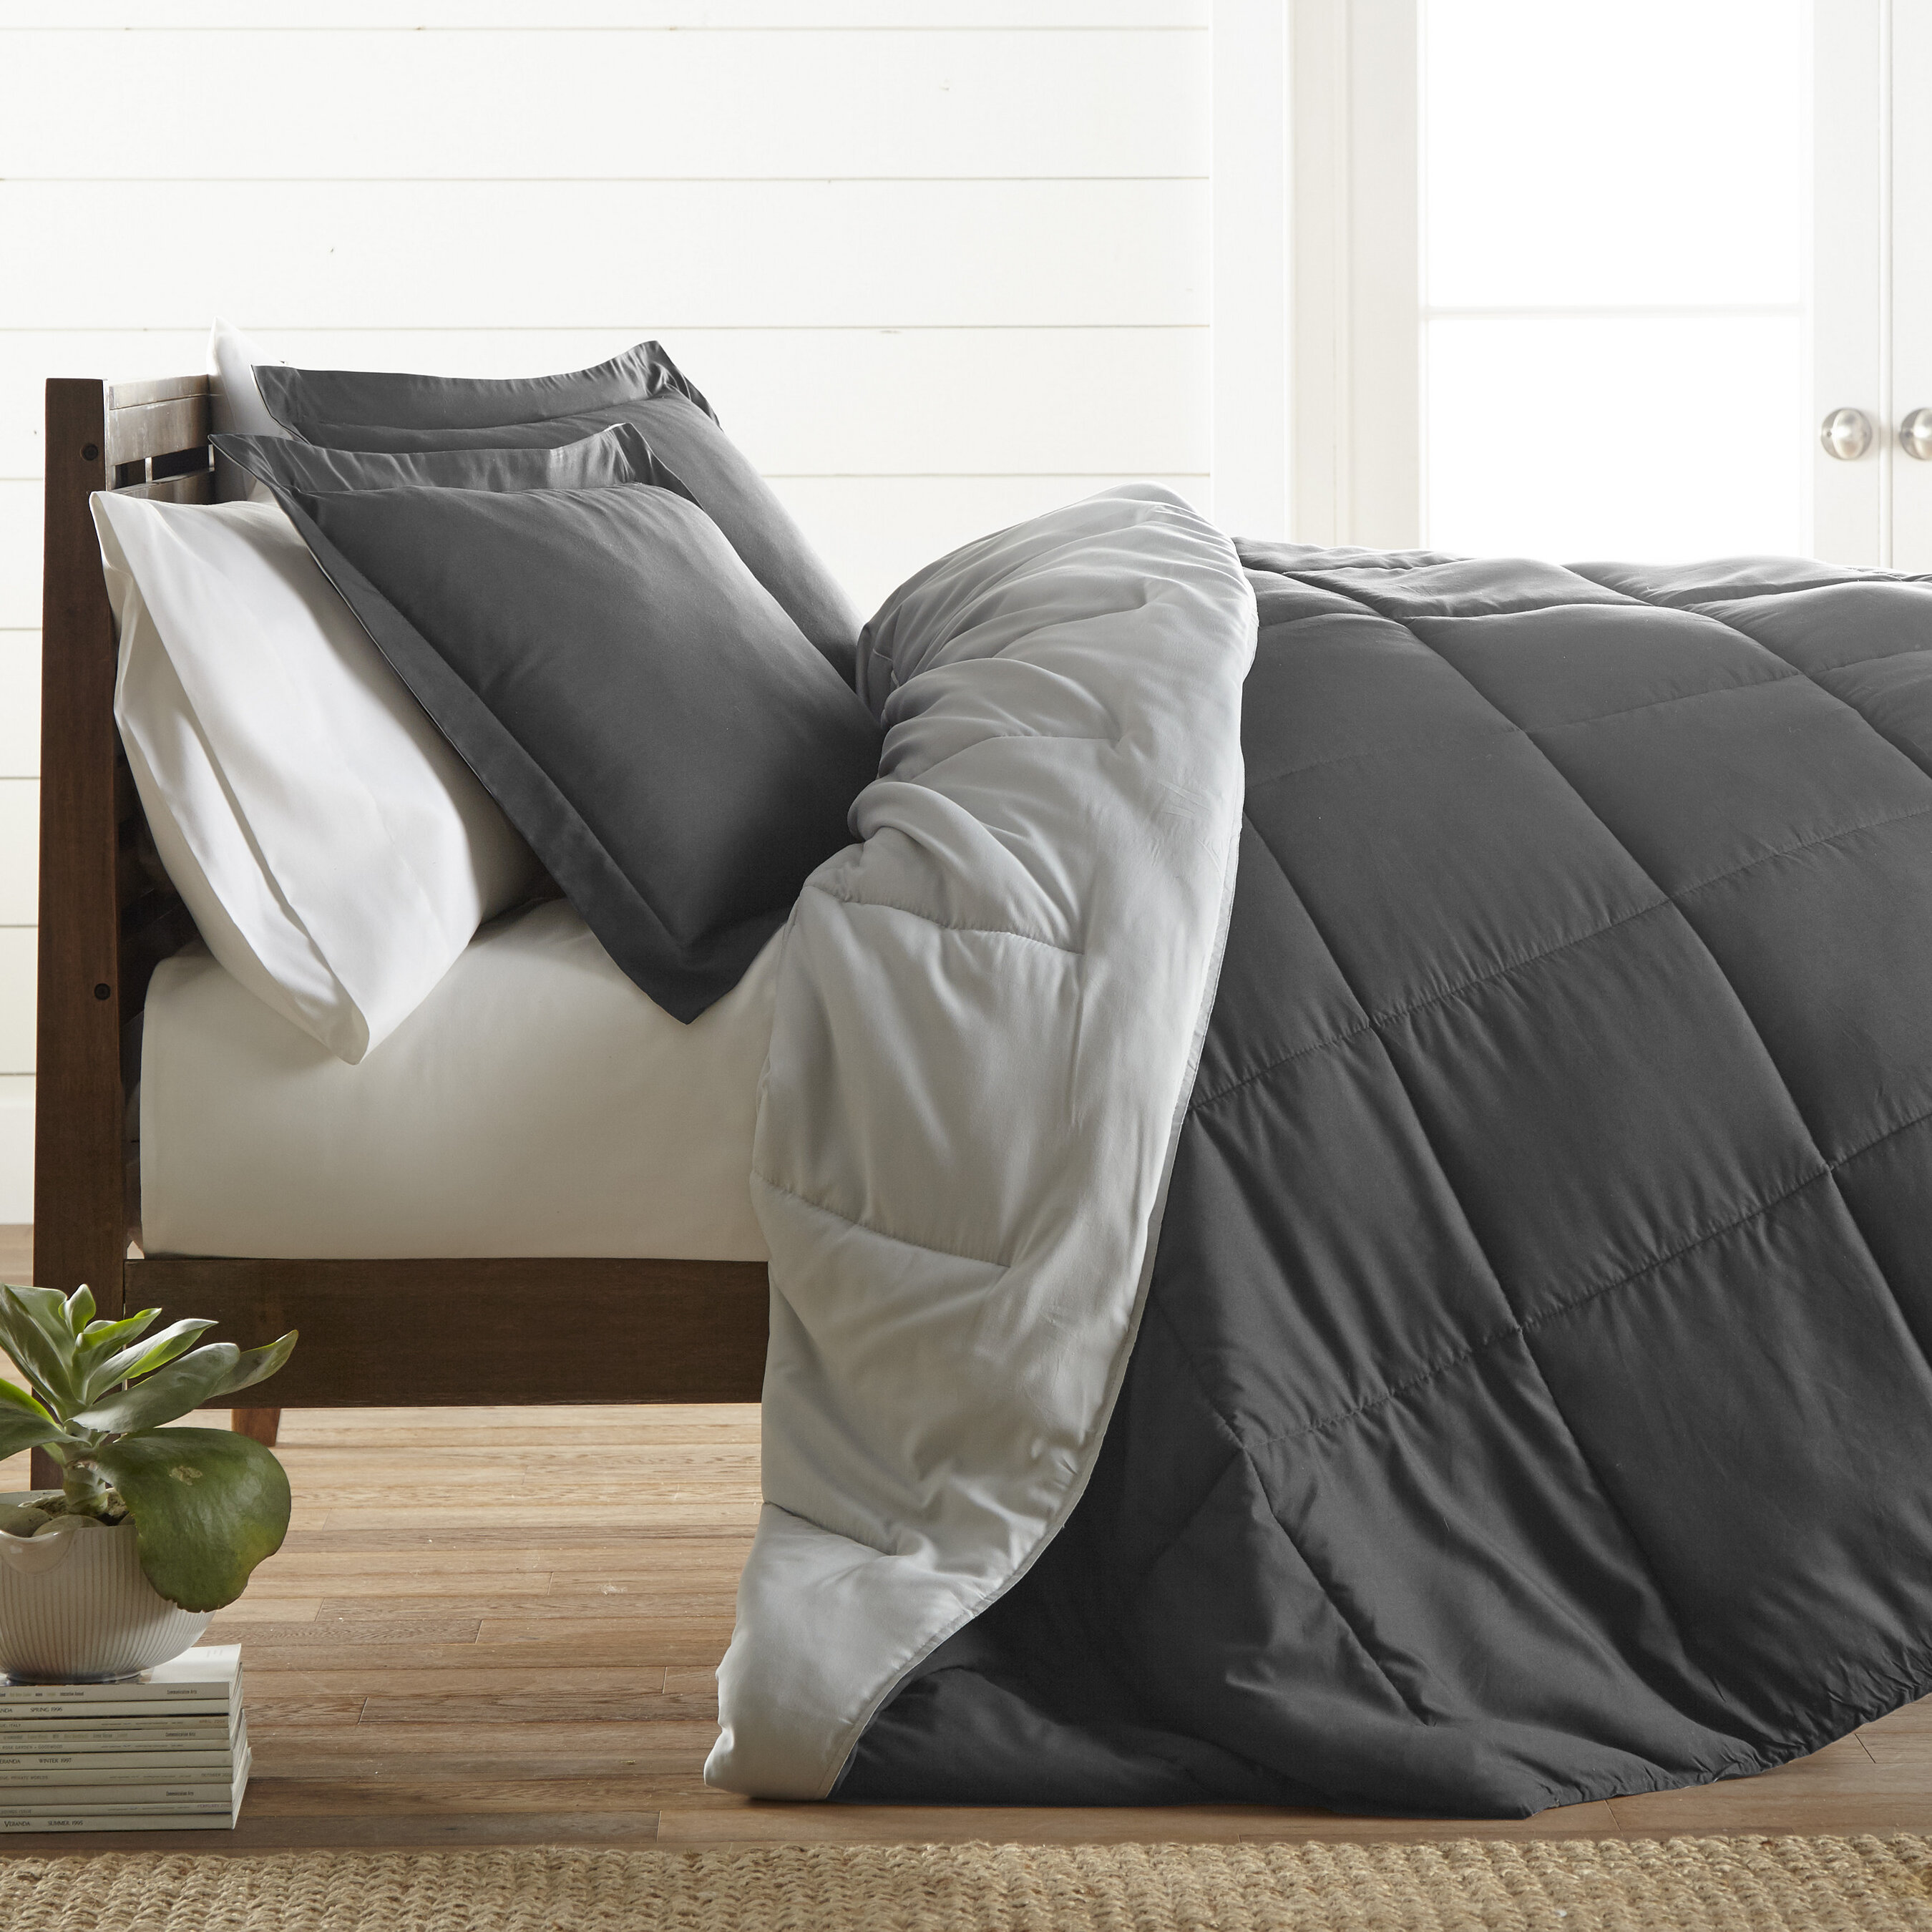 Andover Mills Powhattan Reversible 2 Piece Comforter Set Reviews Wayfair